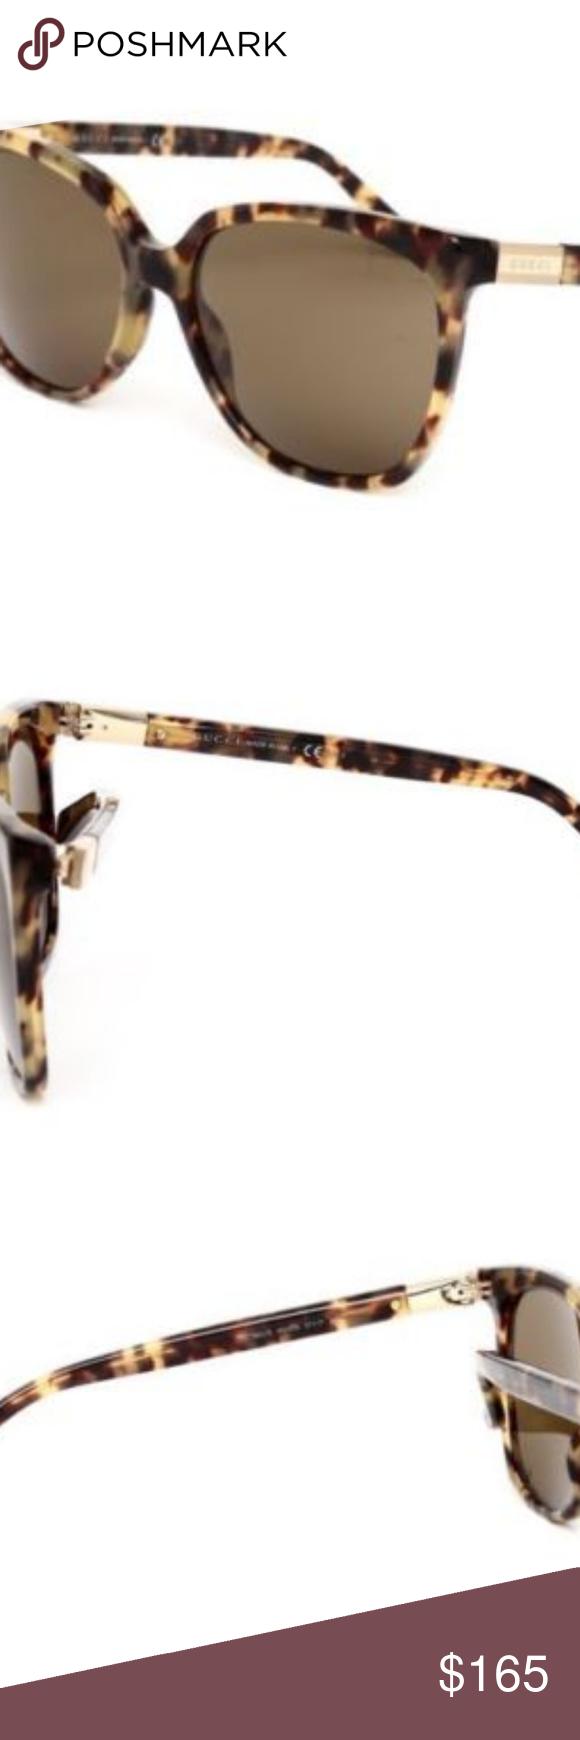 78c9c5e9936d4 GUCCI GG 3502 S Light Havana TORTOISE Sunglasses GUCCI GG 3502 S 4GXDS  Women s